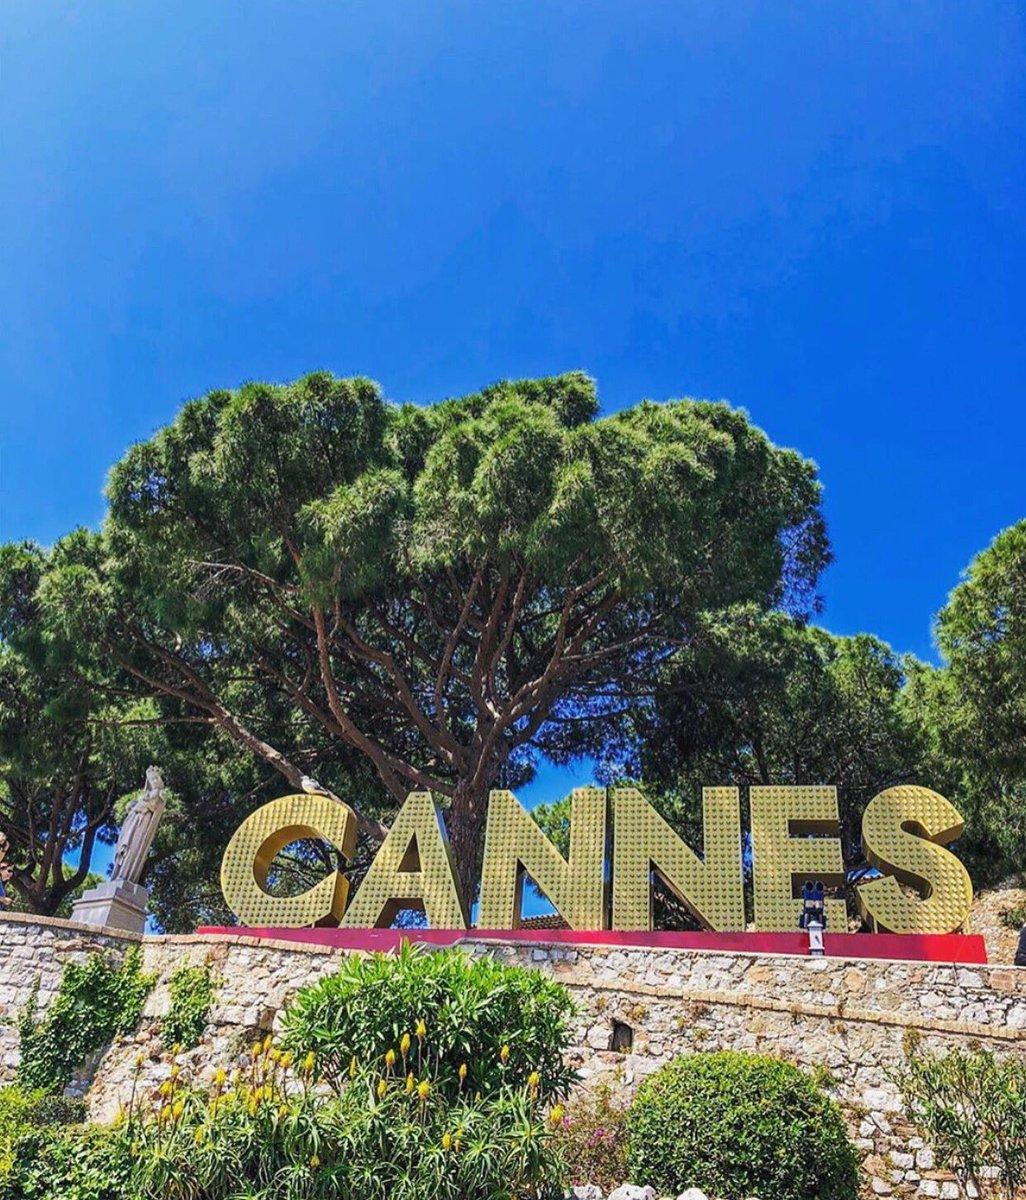 Bon week-end ☀️🌴😎   📸 @cannesislove_   #FrenchRiviera #frenchrivieraguide #cotedazur #cotedazurfrance #cotedazurtourisme #cannesisyours #cannesfrance #cannes #summer #coteazur #cotedazurlife #unlimitedfrenchriviera